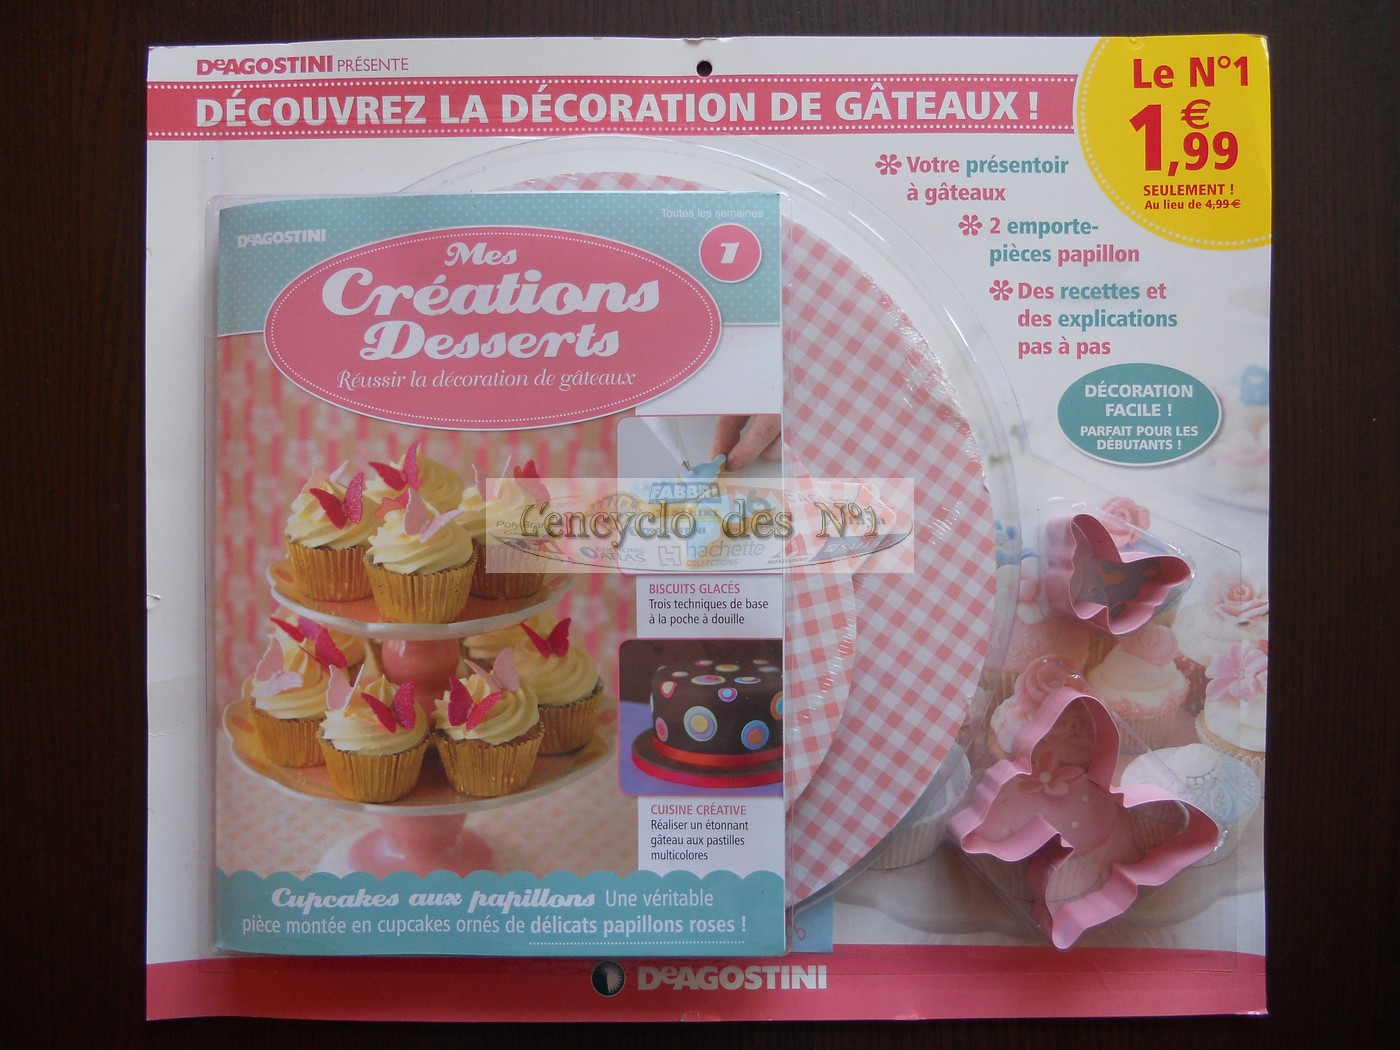 N° 1 Mes créations desserts - Test - DeAgostini - Mars 2012 Mod_html215849_4f68f345117ee